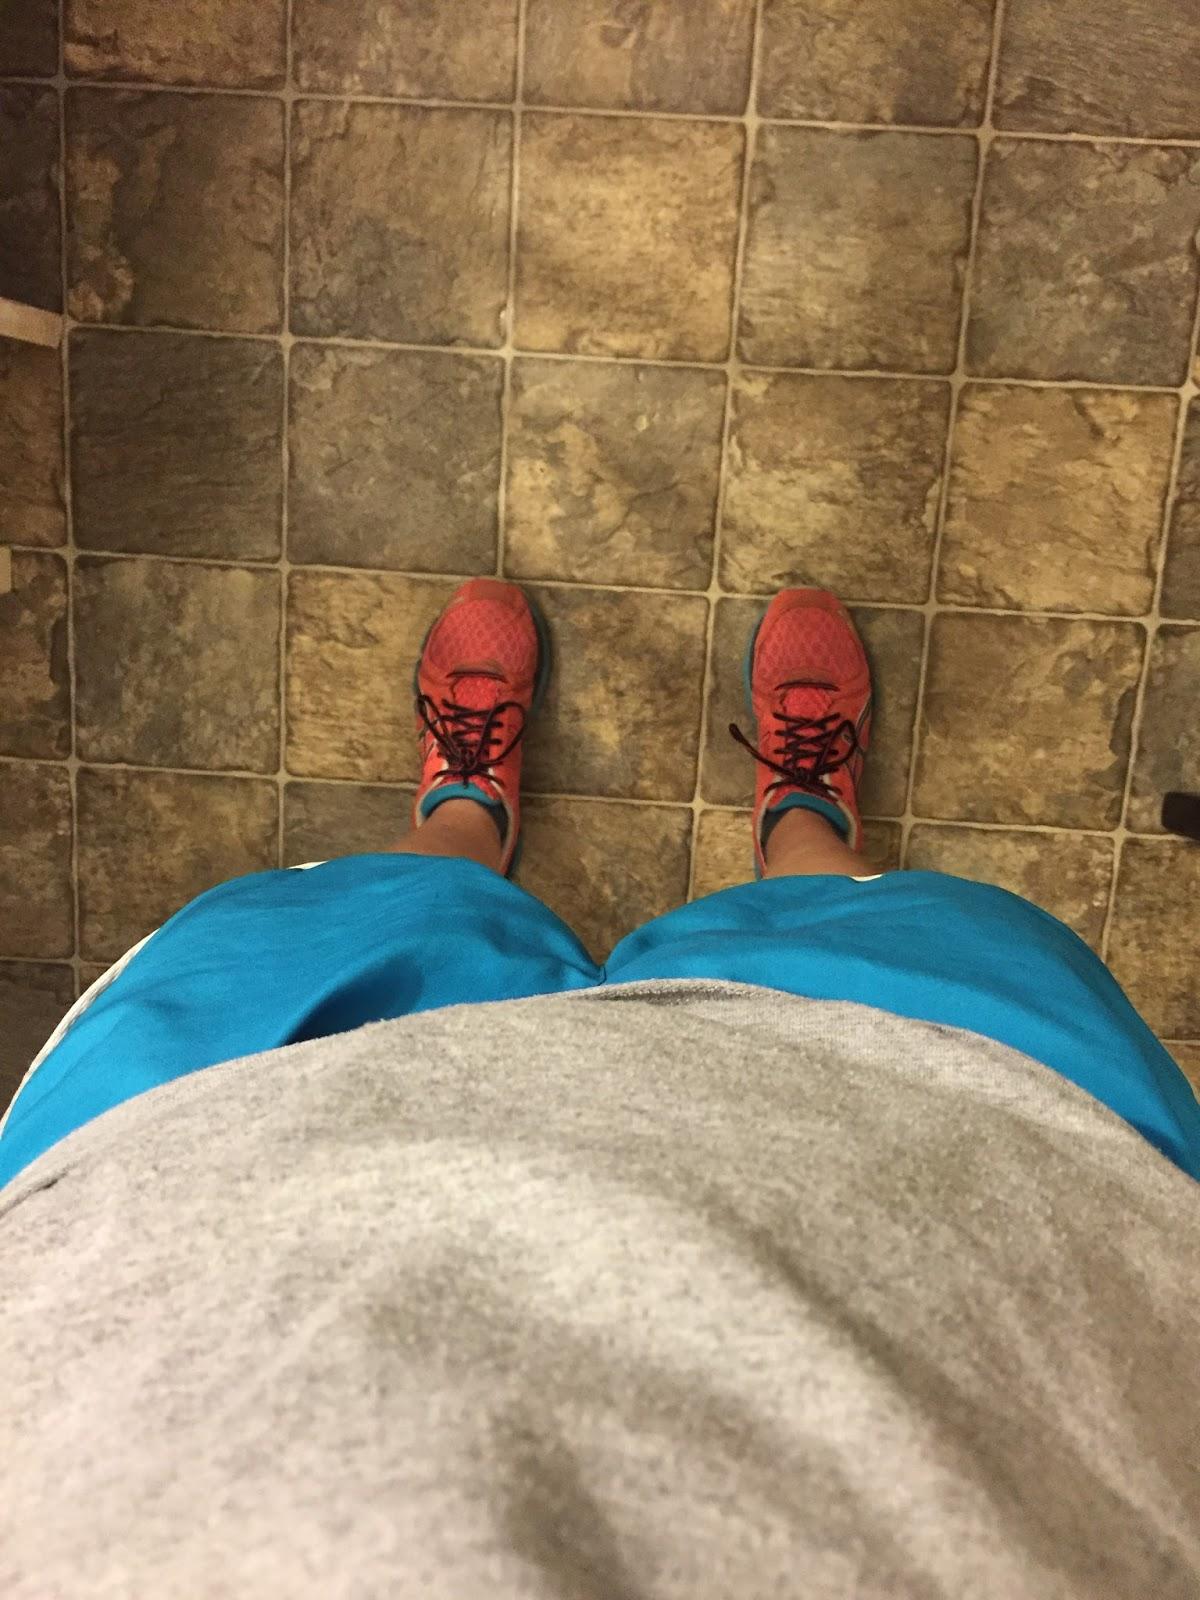 Treadmill running watching House